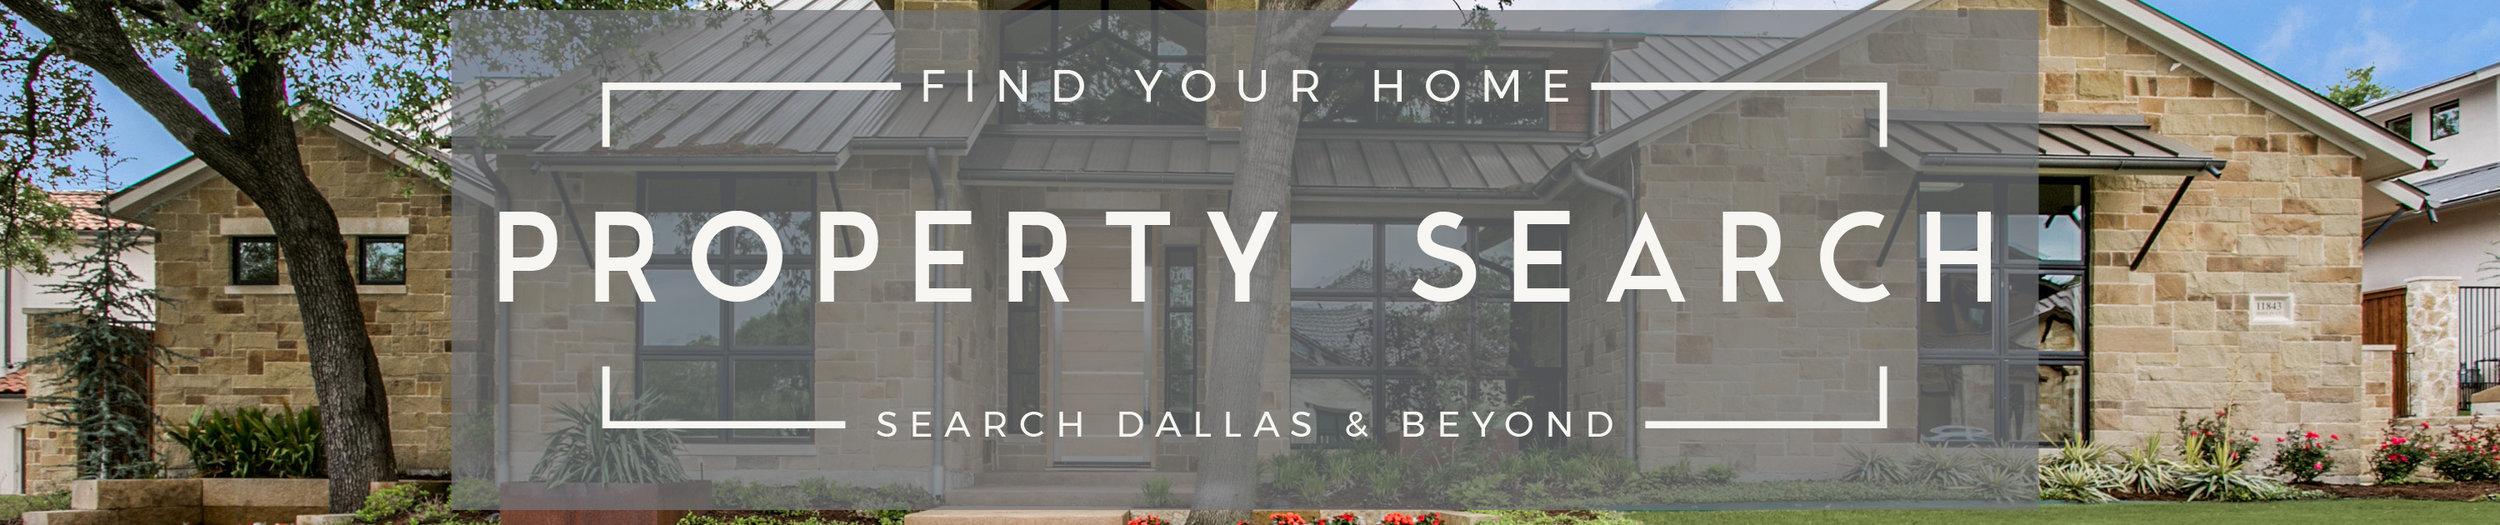 header property search.jpg